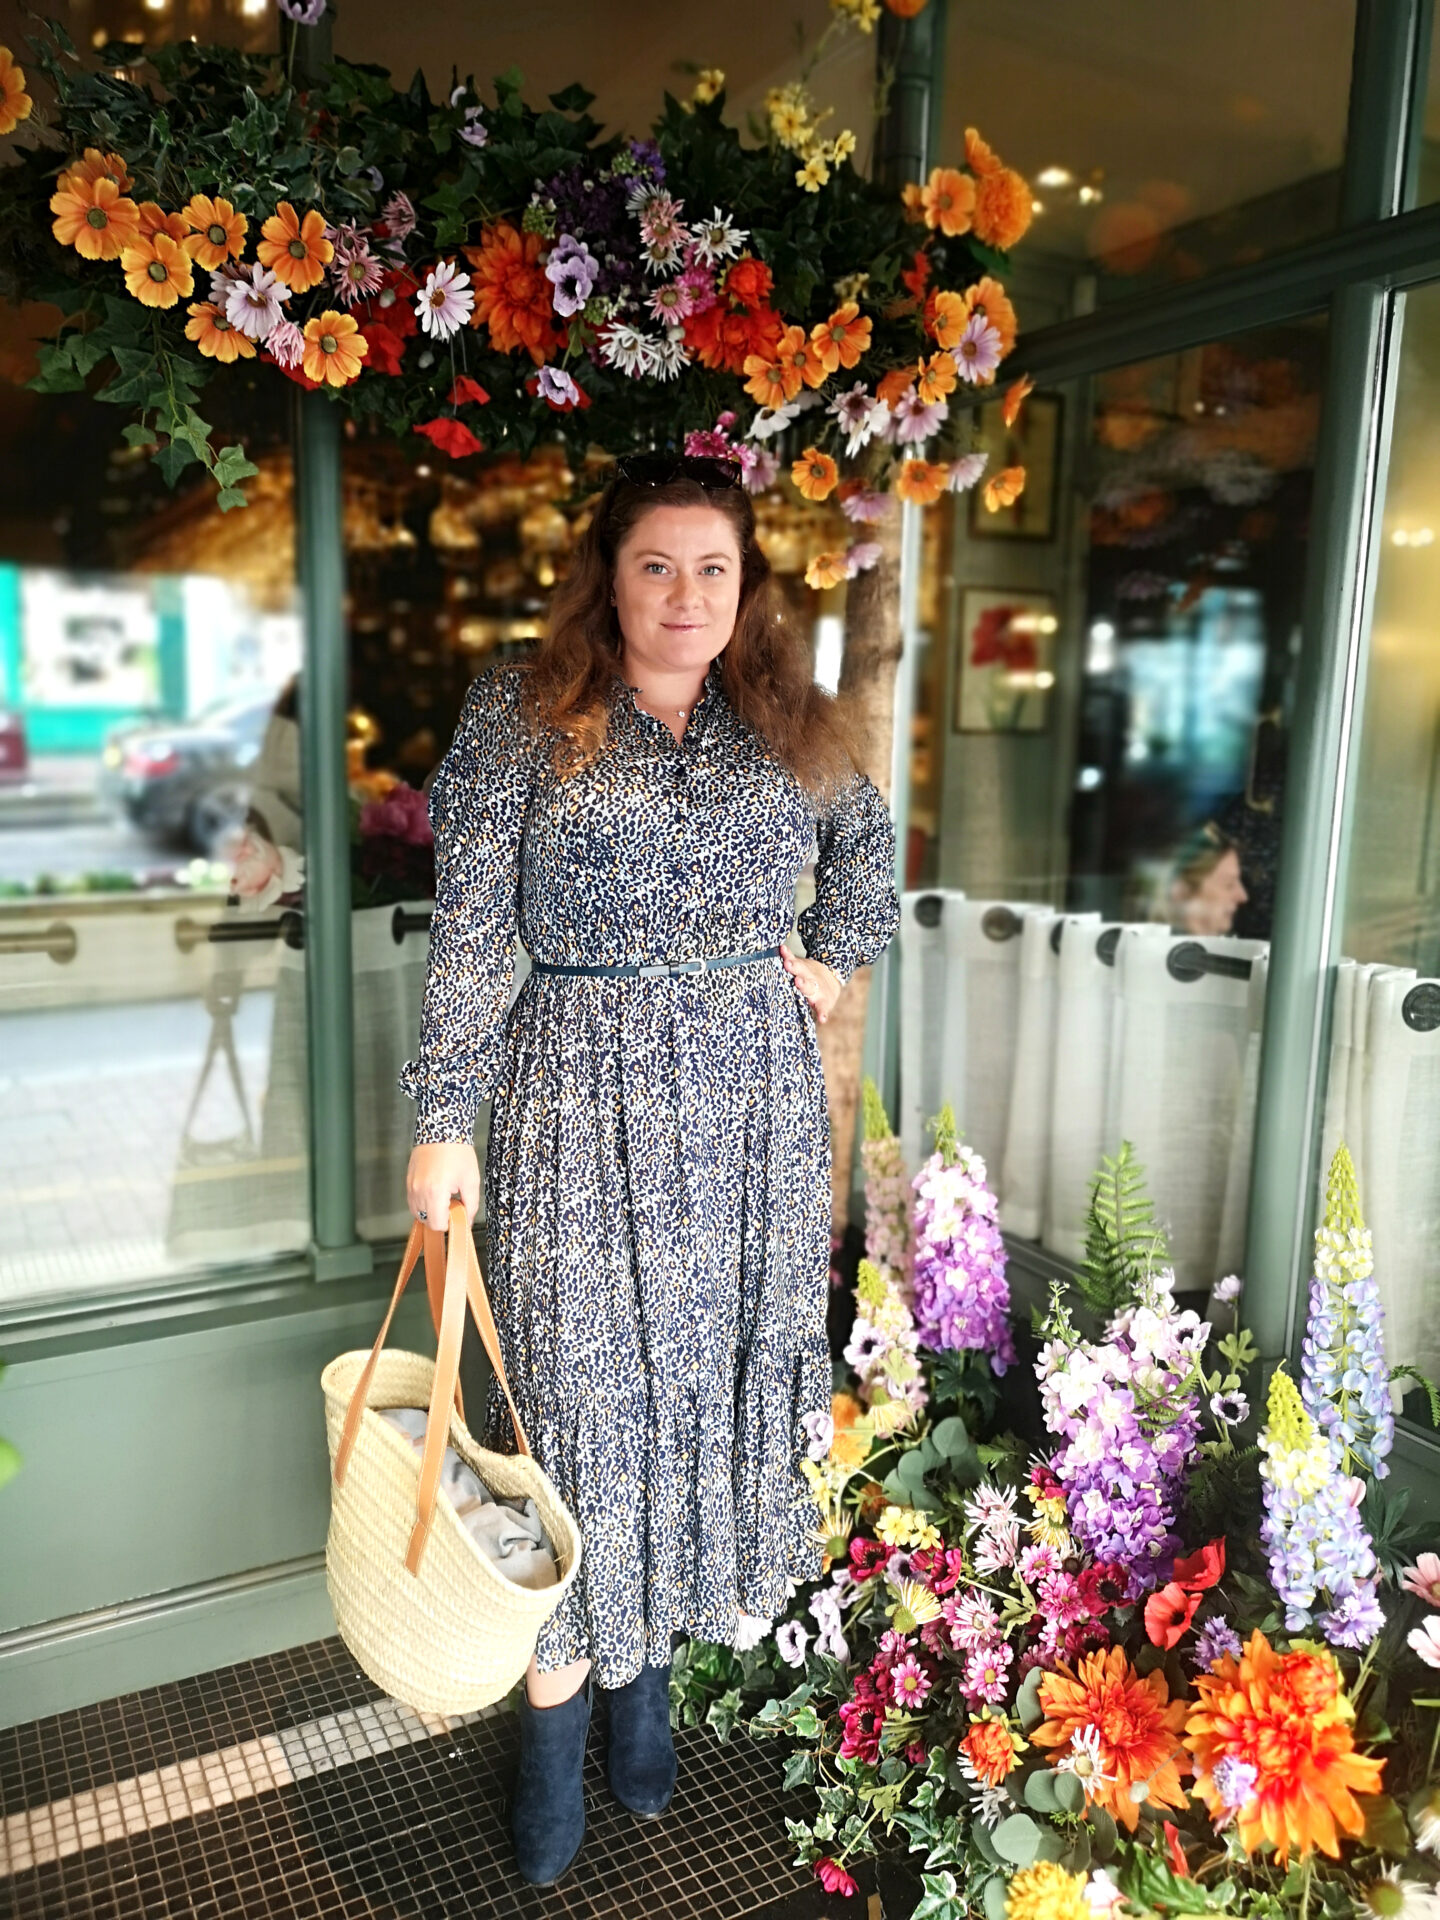 Baukjen Voucher, Fashion Giveaway, Slow Fashion, Sustainable Fashion, Ethical Fashion, Conscious Clothing, The Bonnie Dress, Animal Print, Leopard Print, AW21, Baukjen, Designed For Good, Win, Giveaway, the Frenchie Mummy